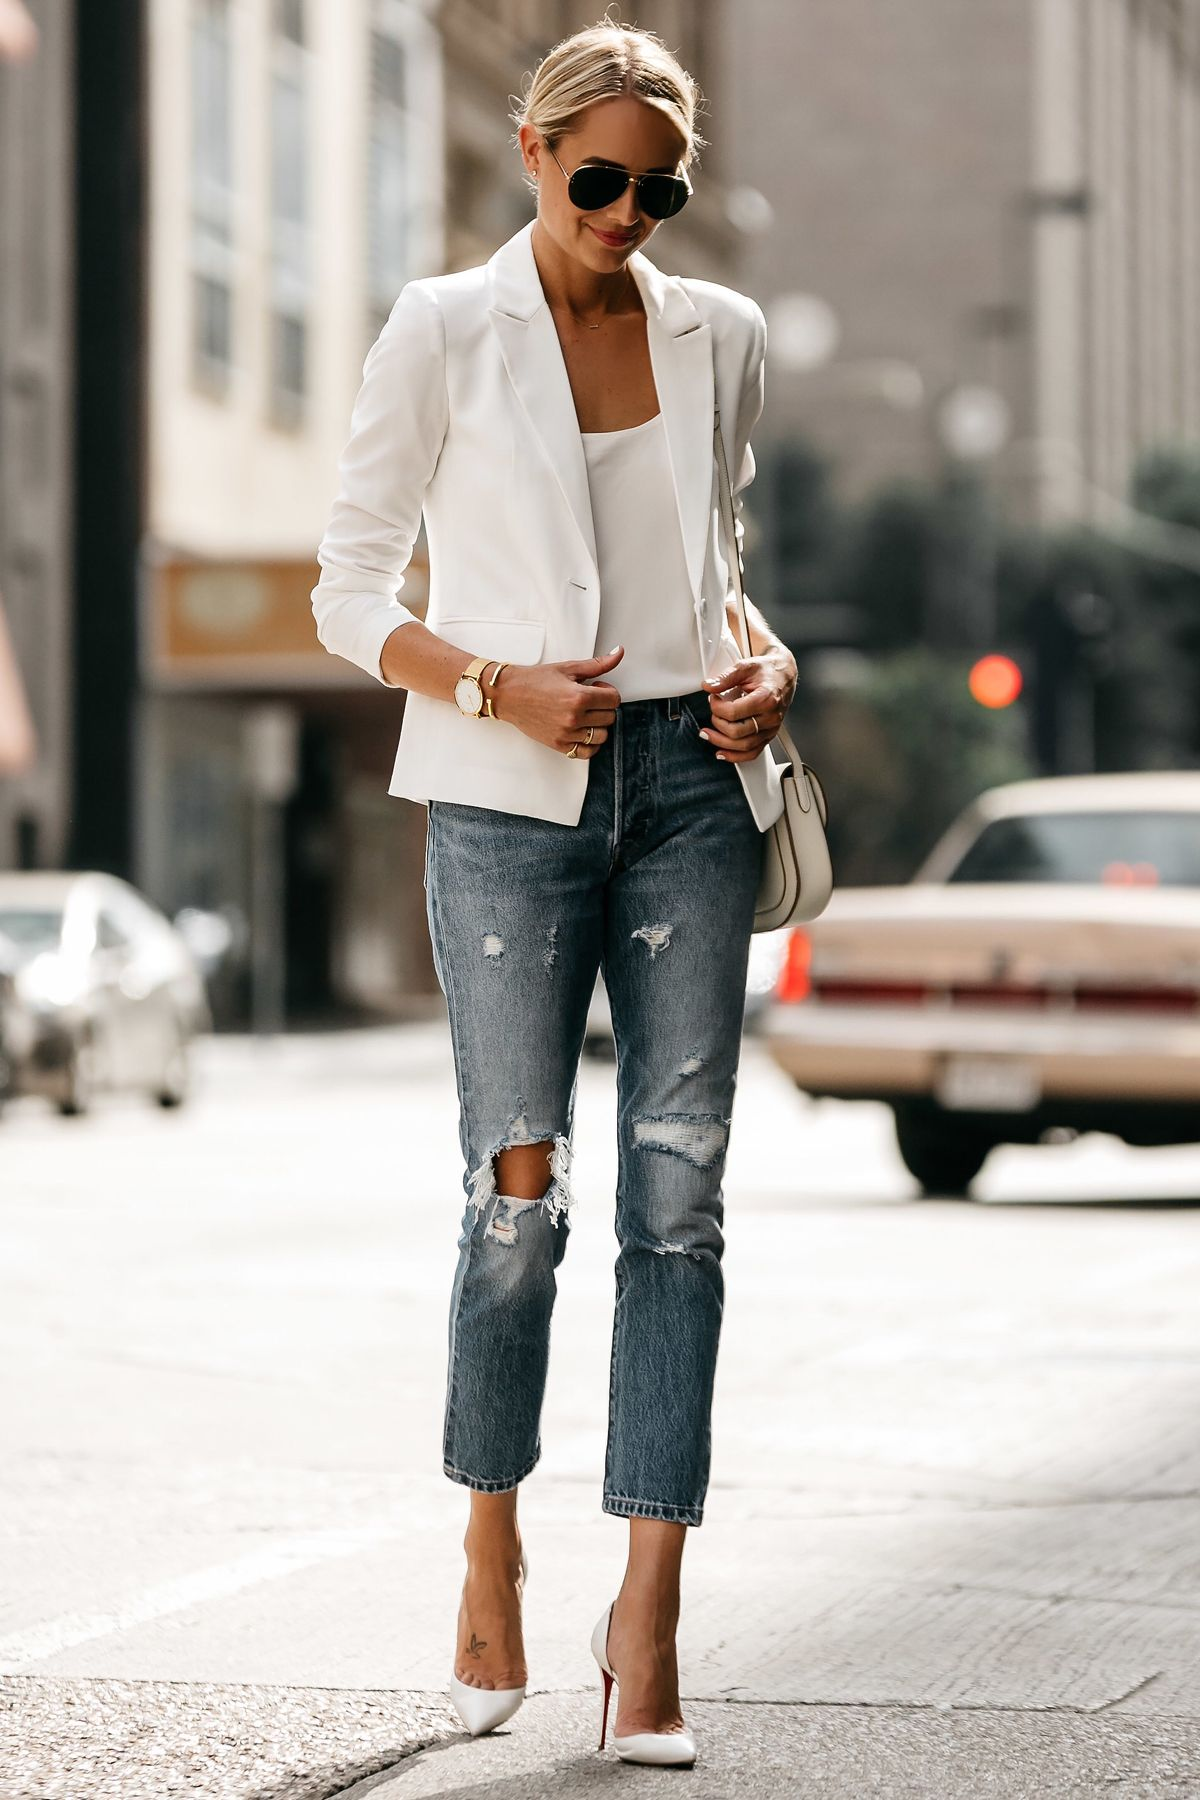 Fashion Jackson Blonde Woman Wearing White Blazer ...